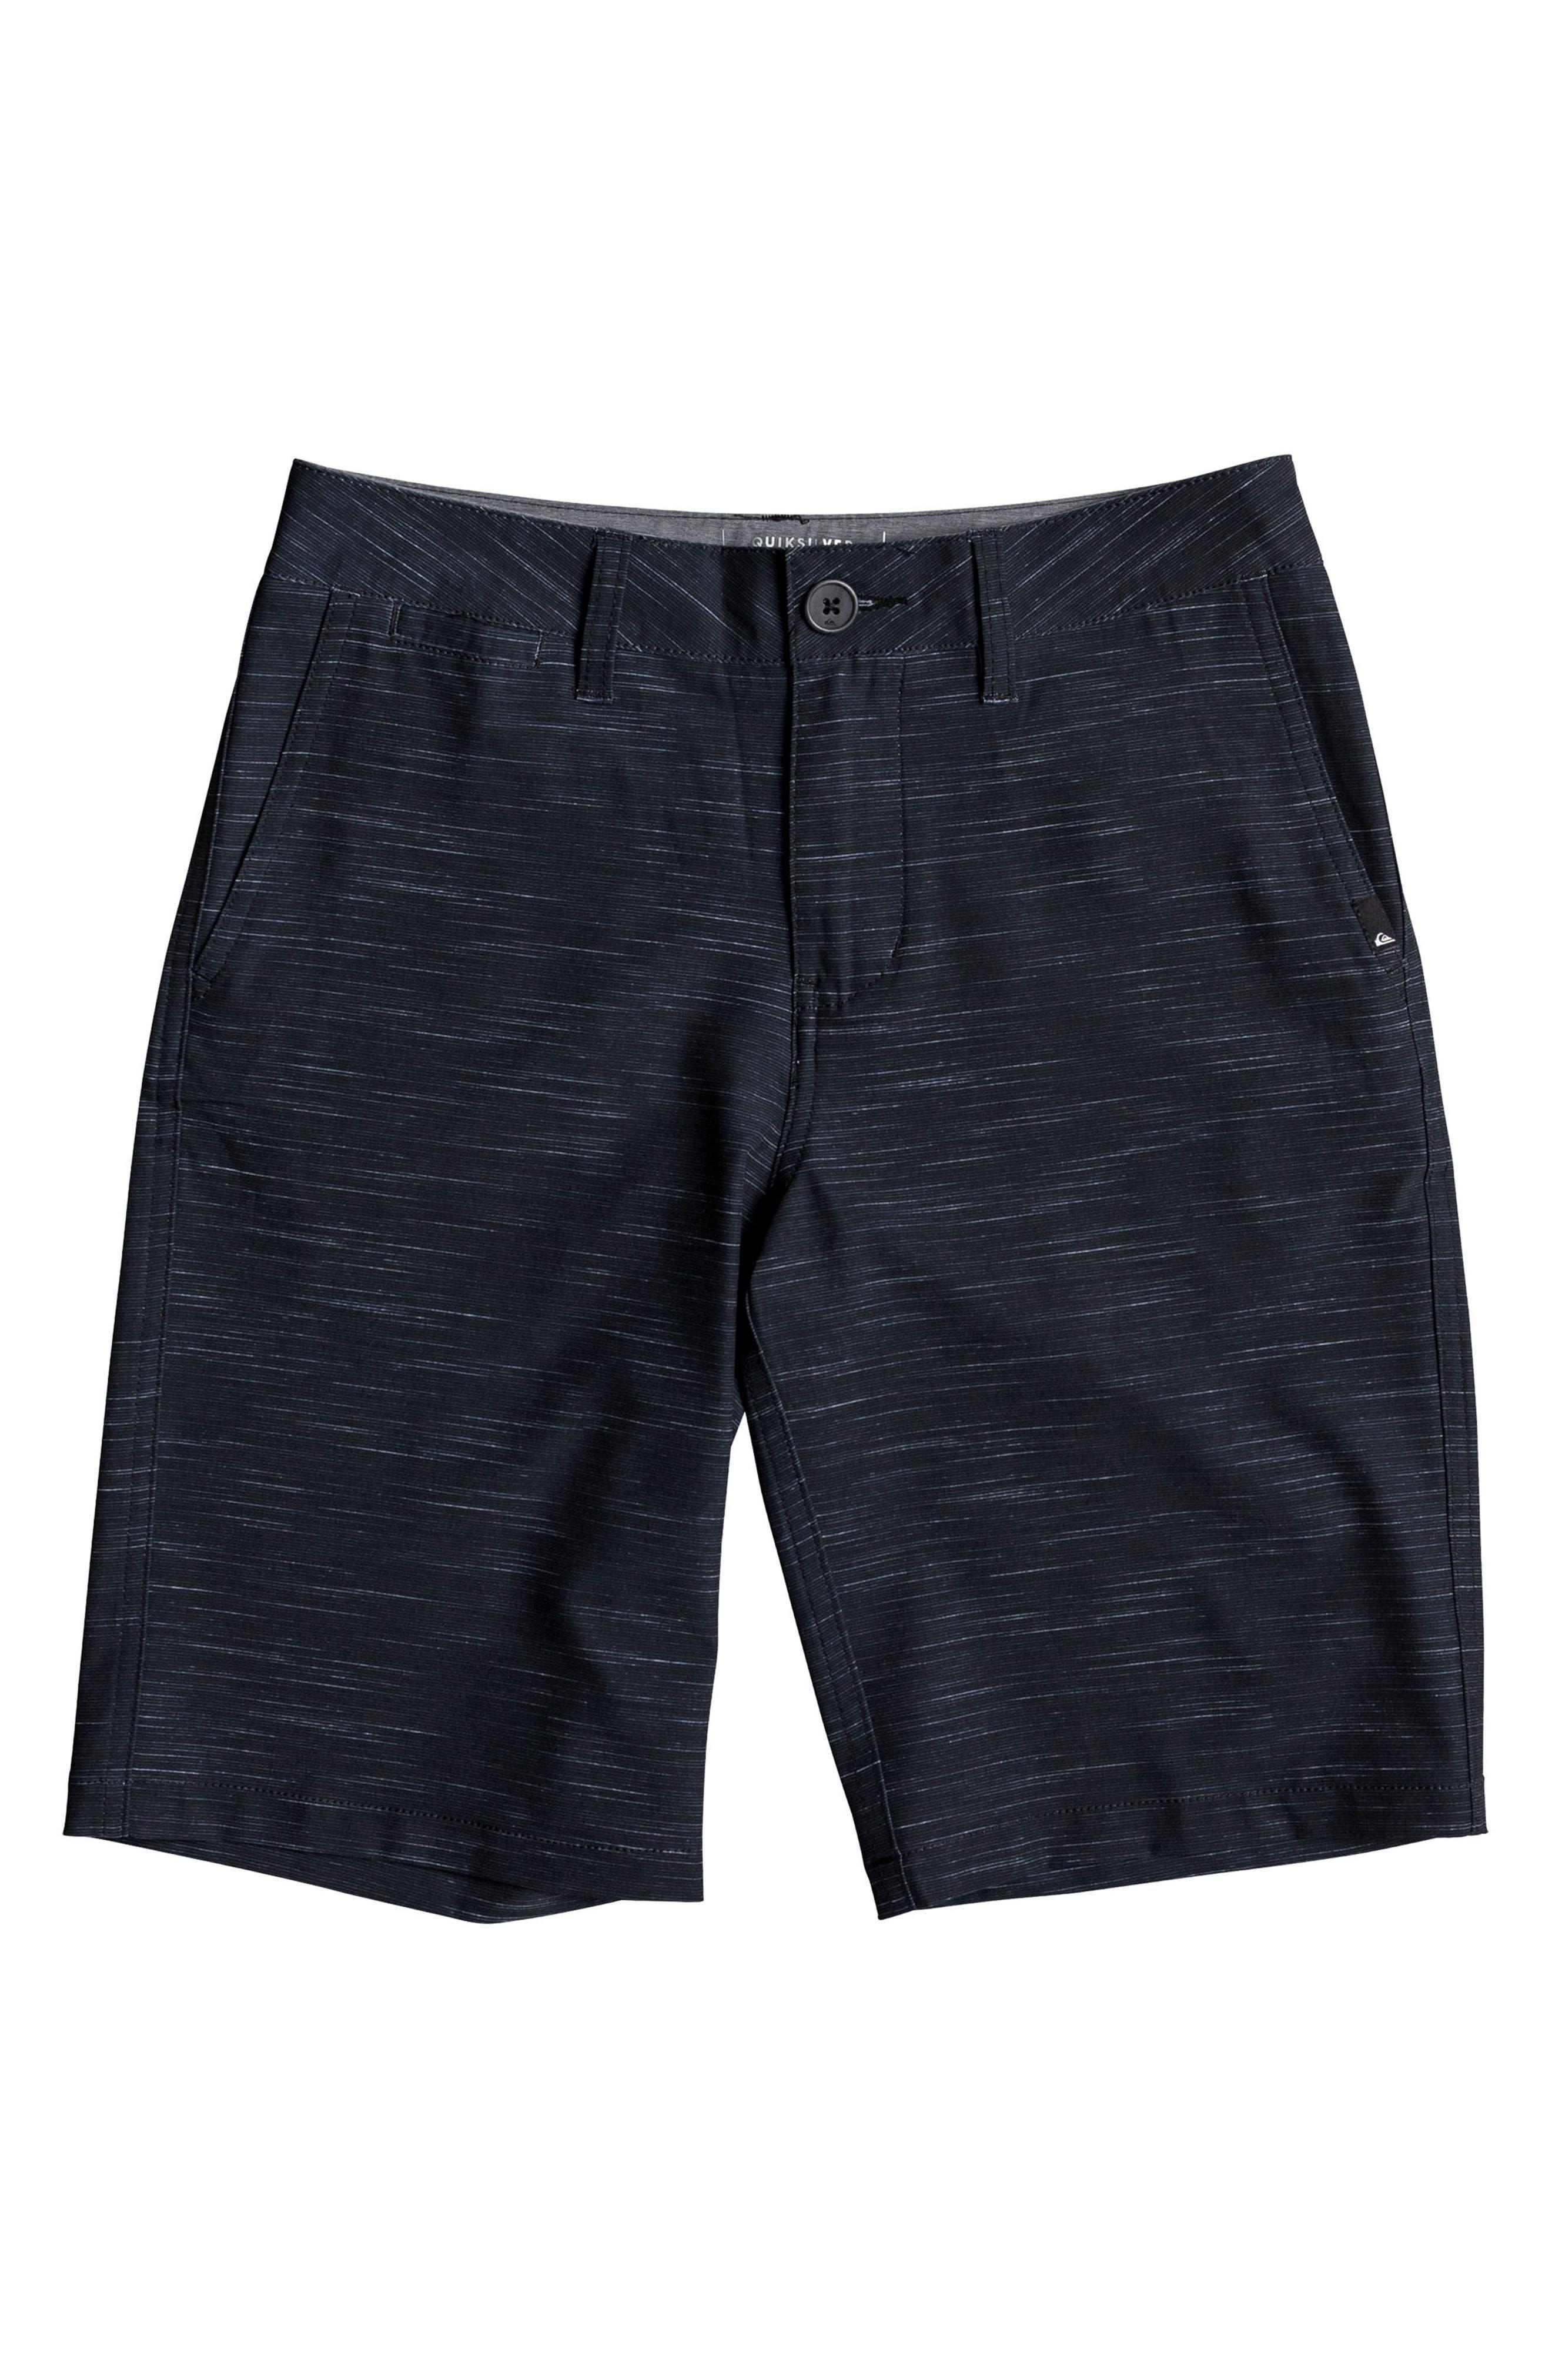 Union Slub Amphibian Board Shorts,                         Main,                         color, Black